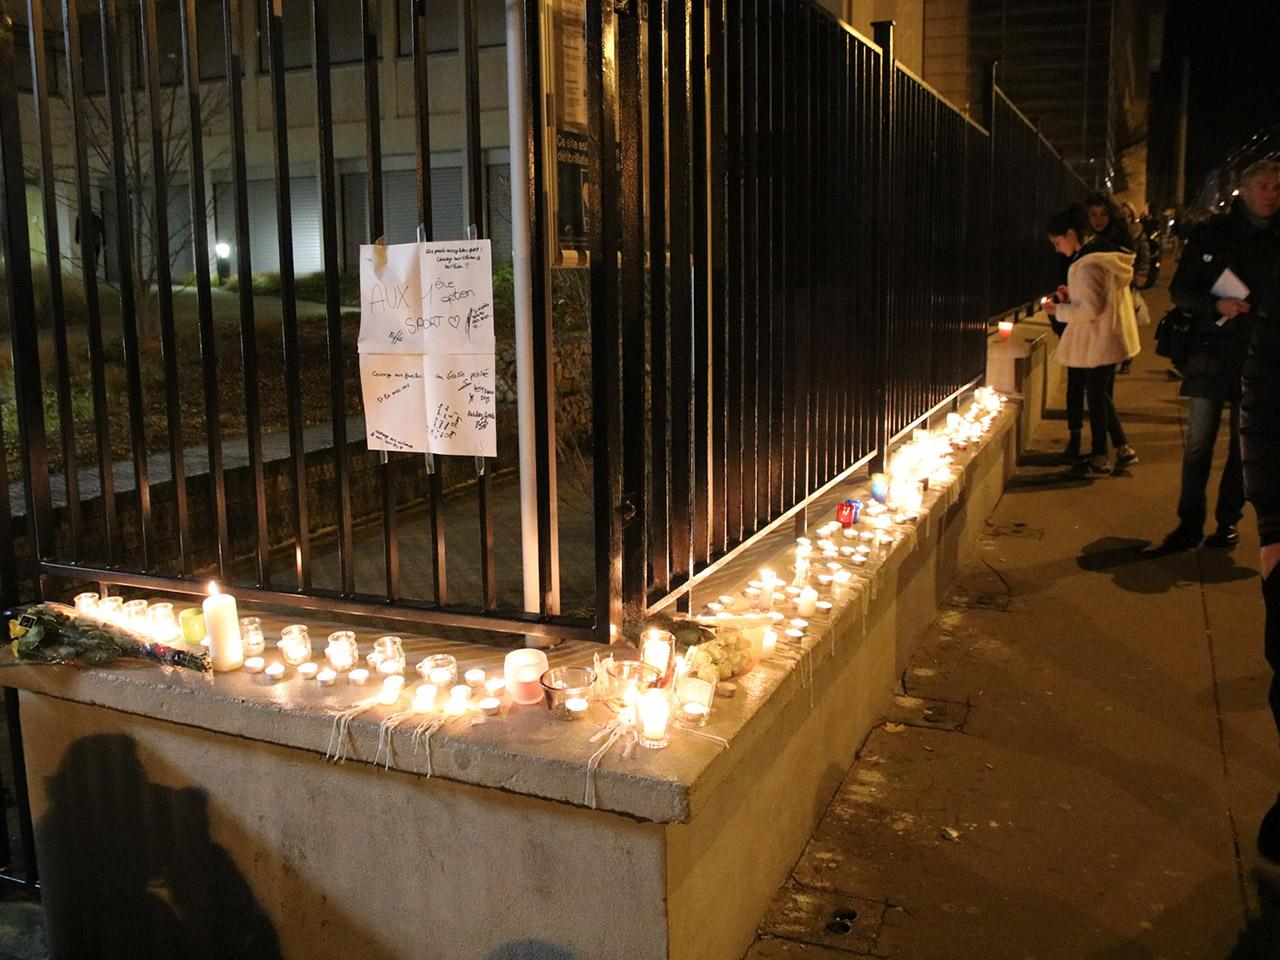 Le lycée Saint-Exupéry en deuil ce mercredi soir - LyonMag